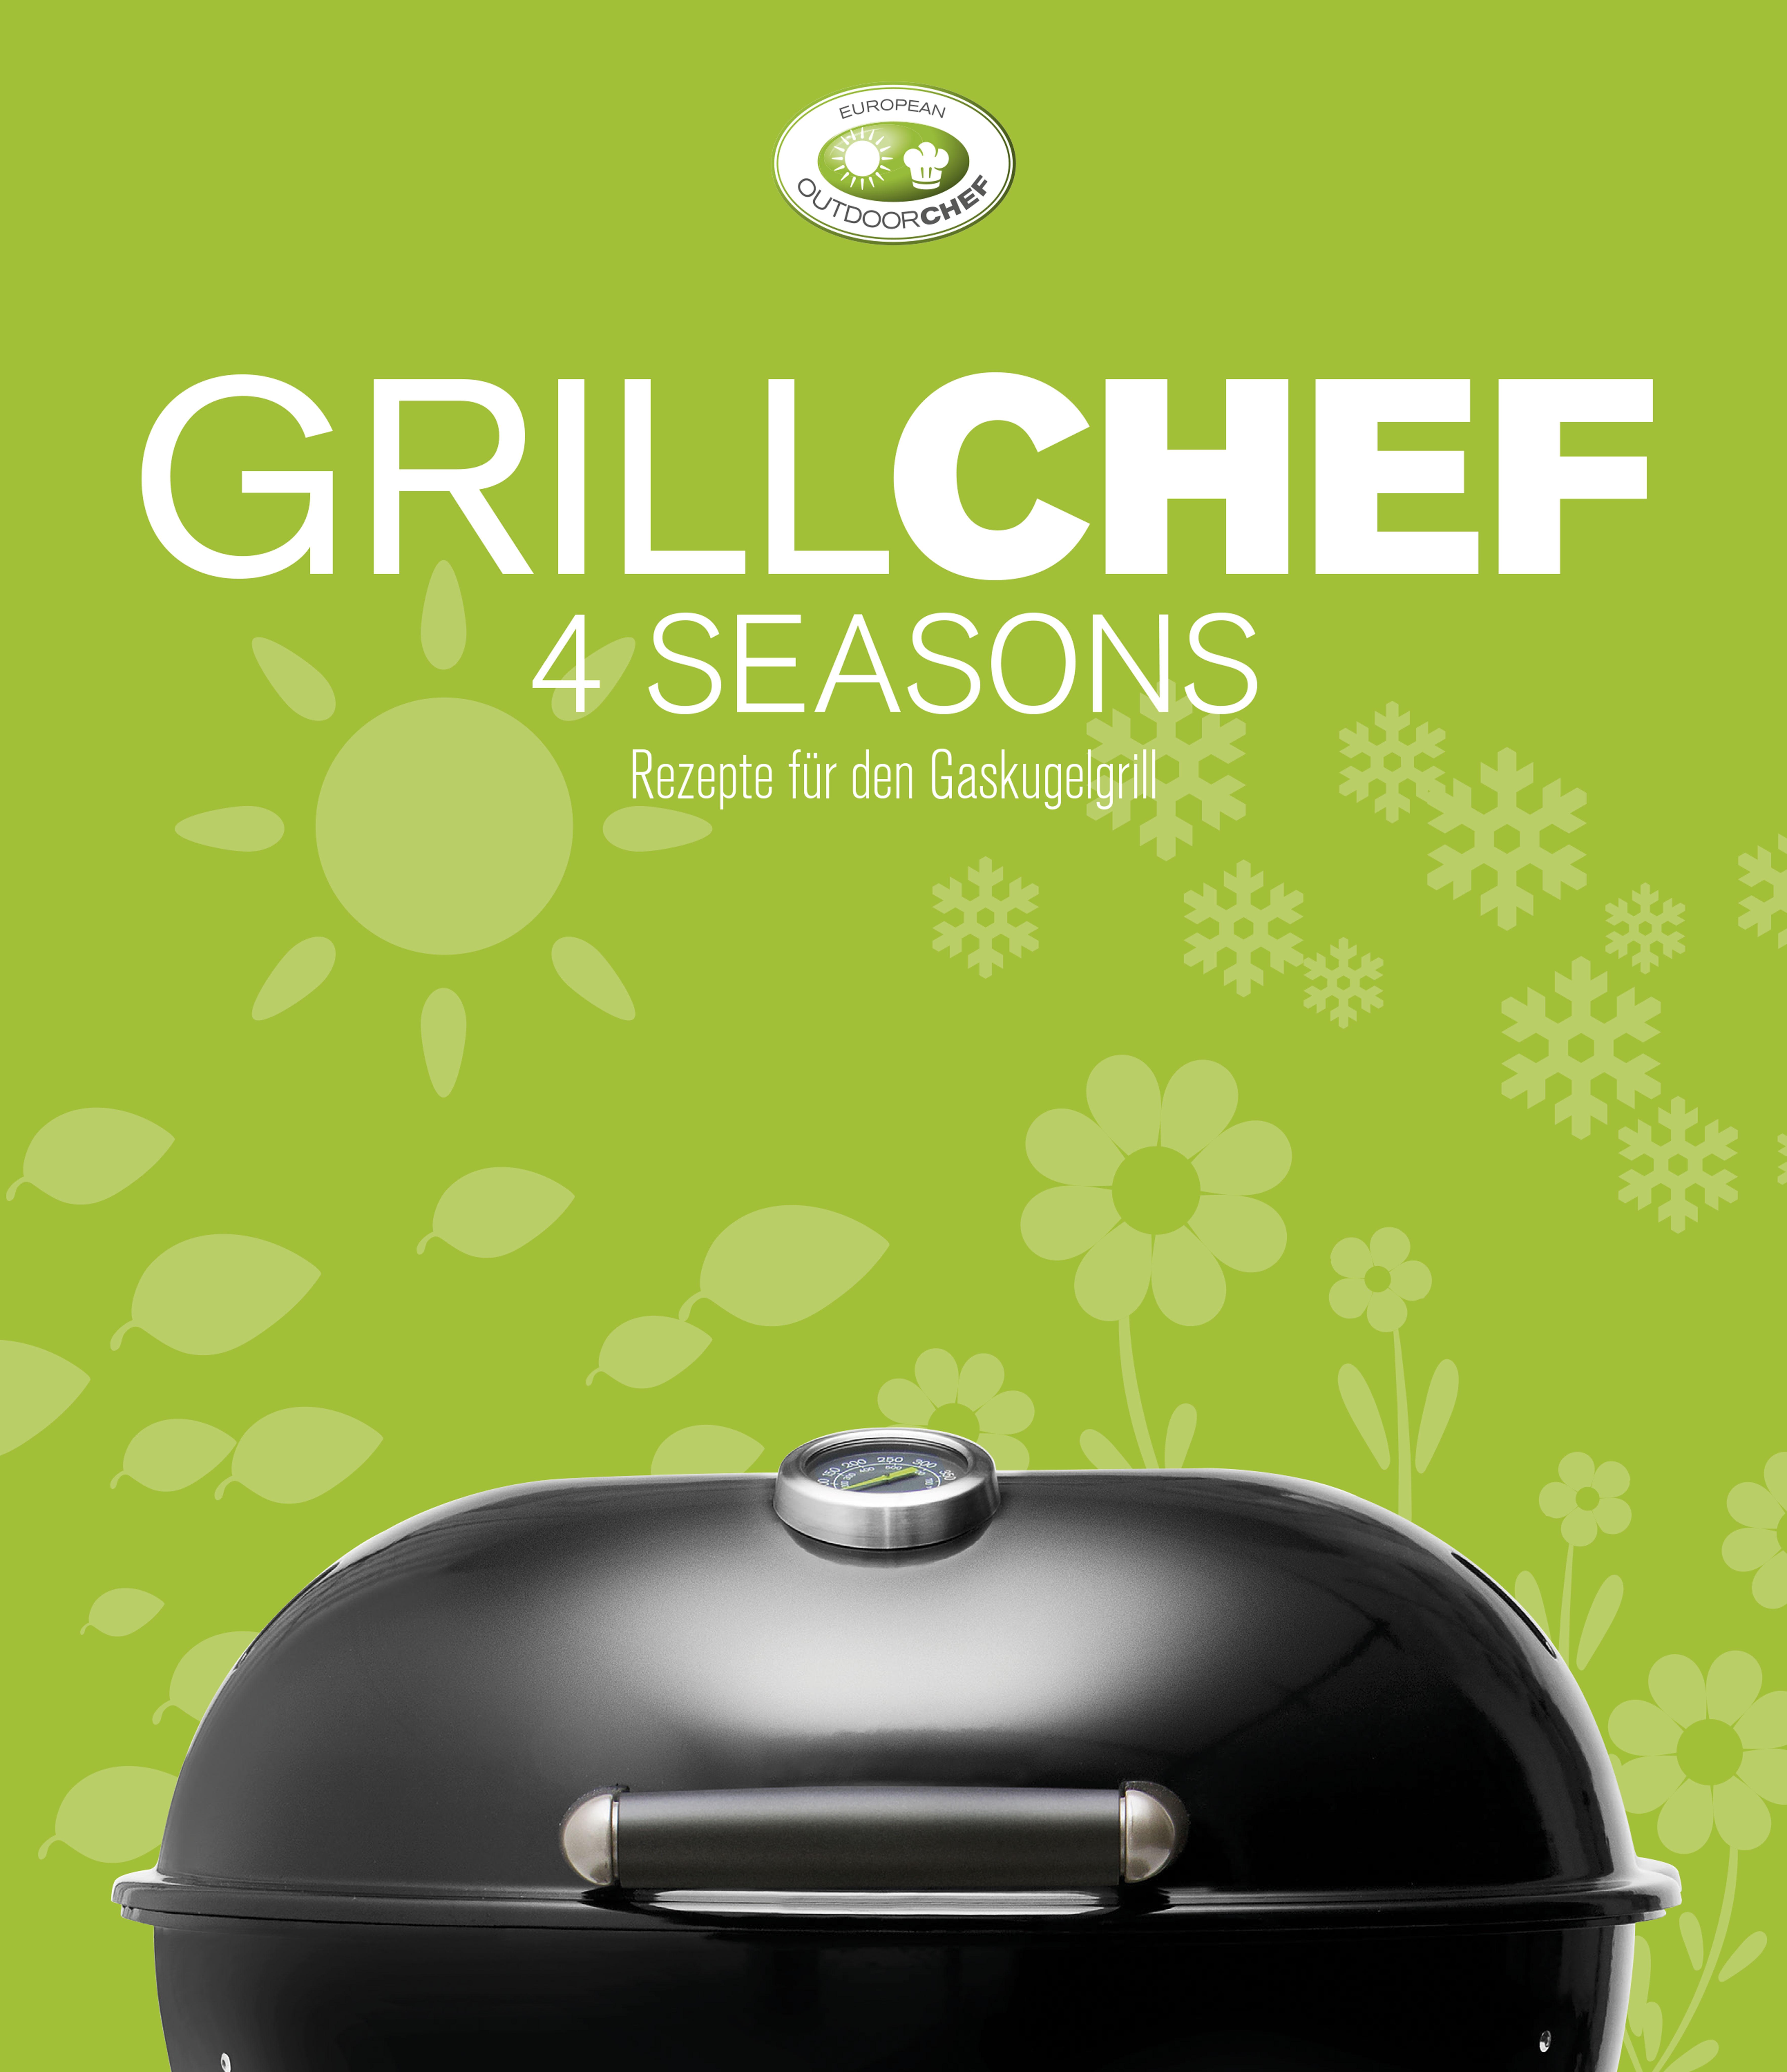 GrillChef-4-seasons-Andreas-Thumm-9783037805633